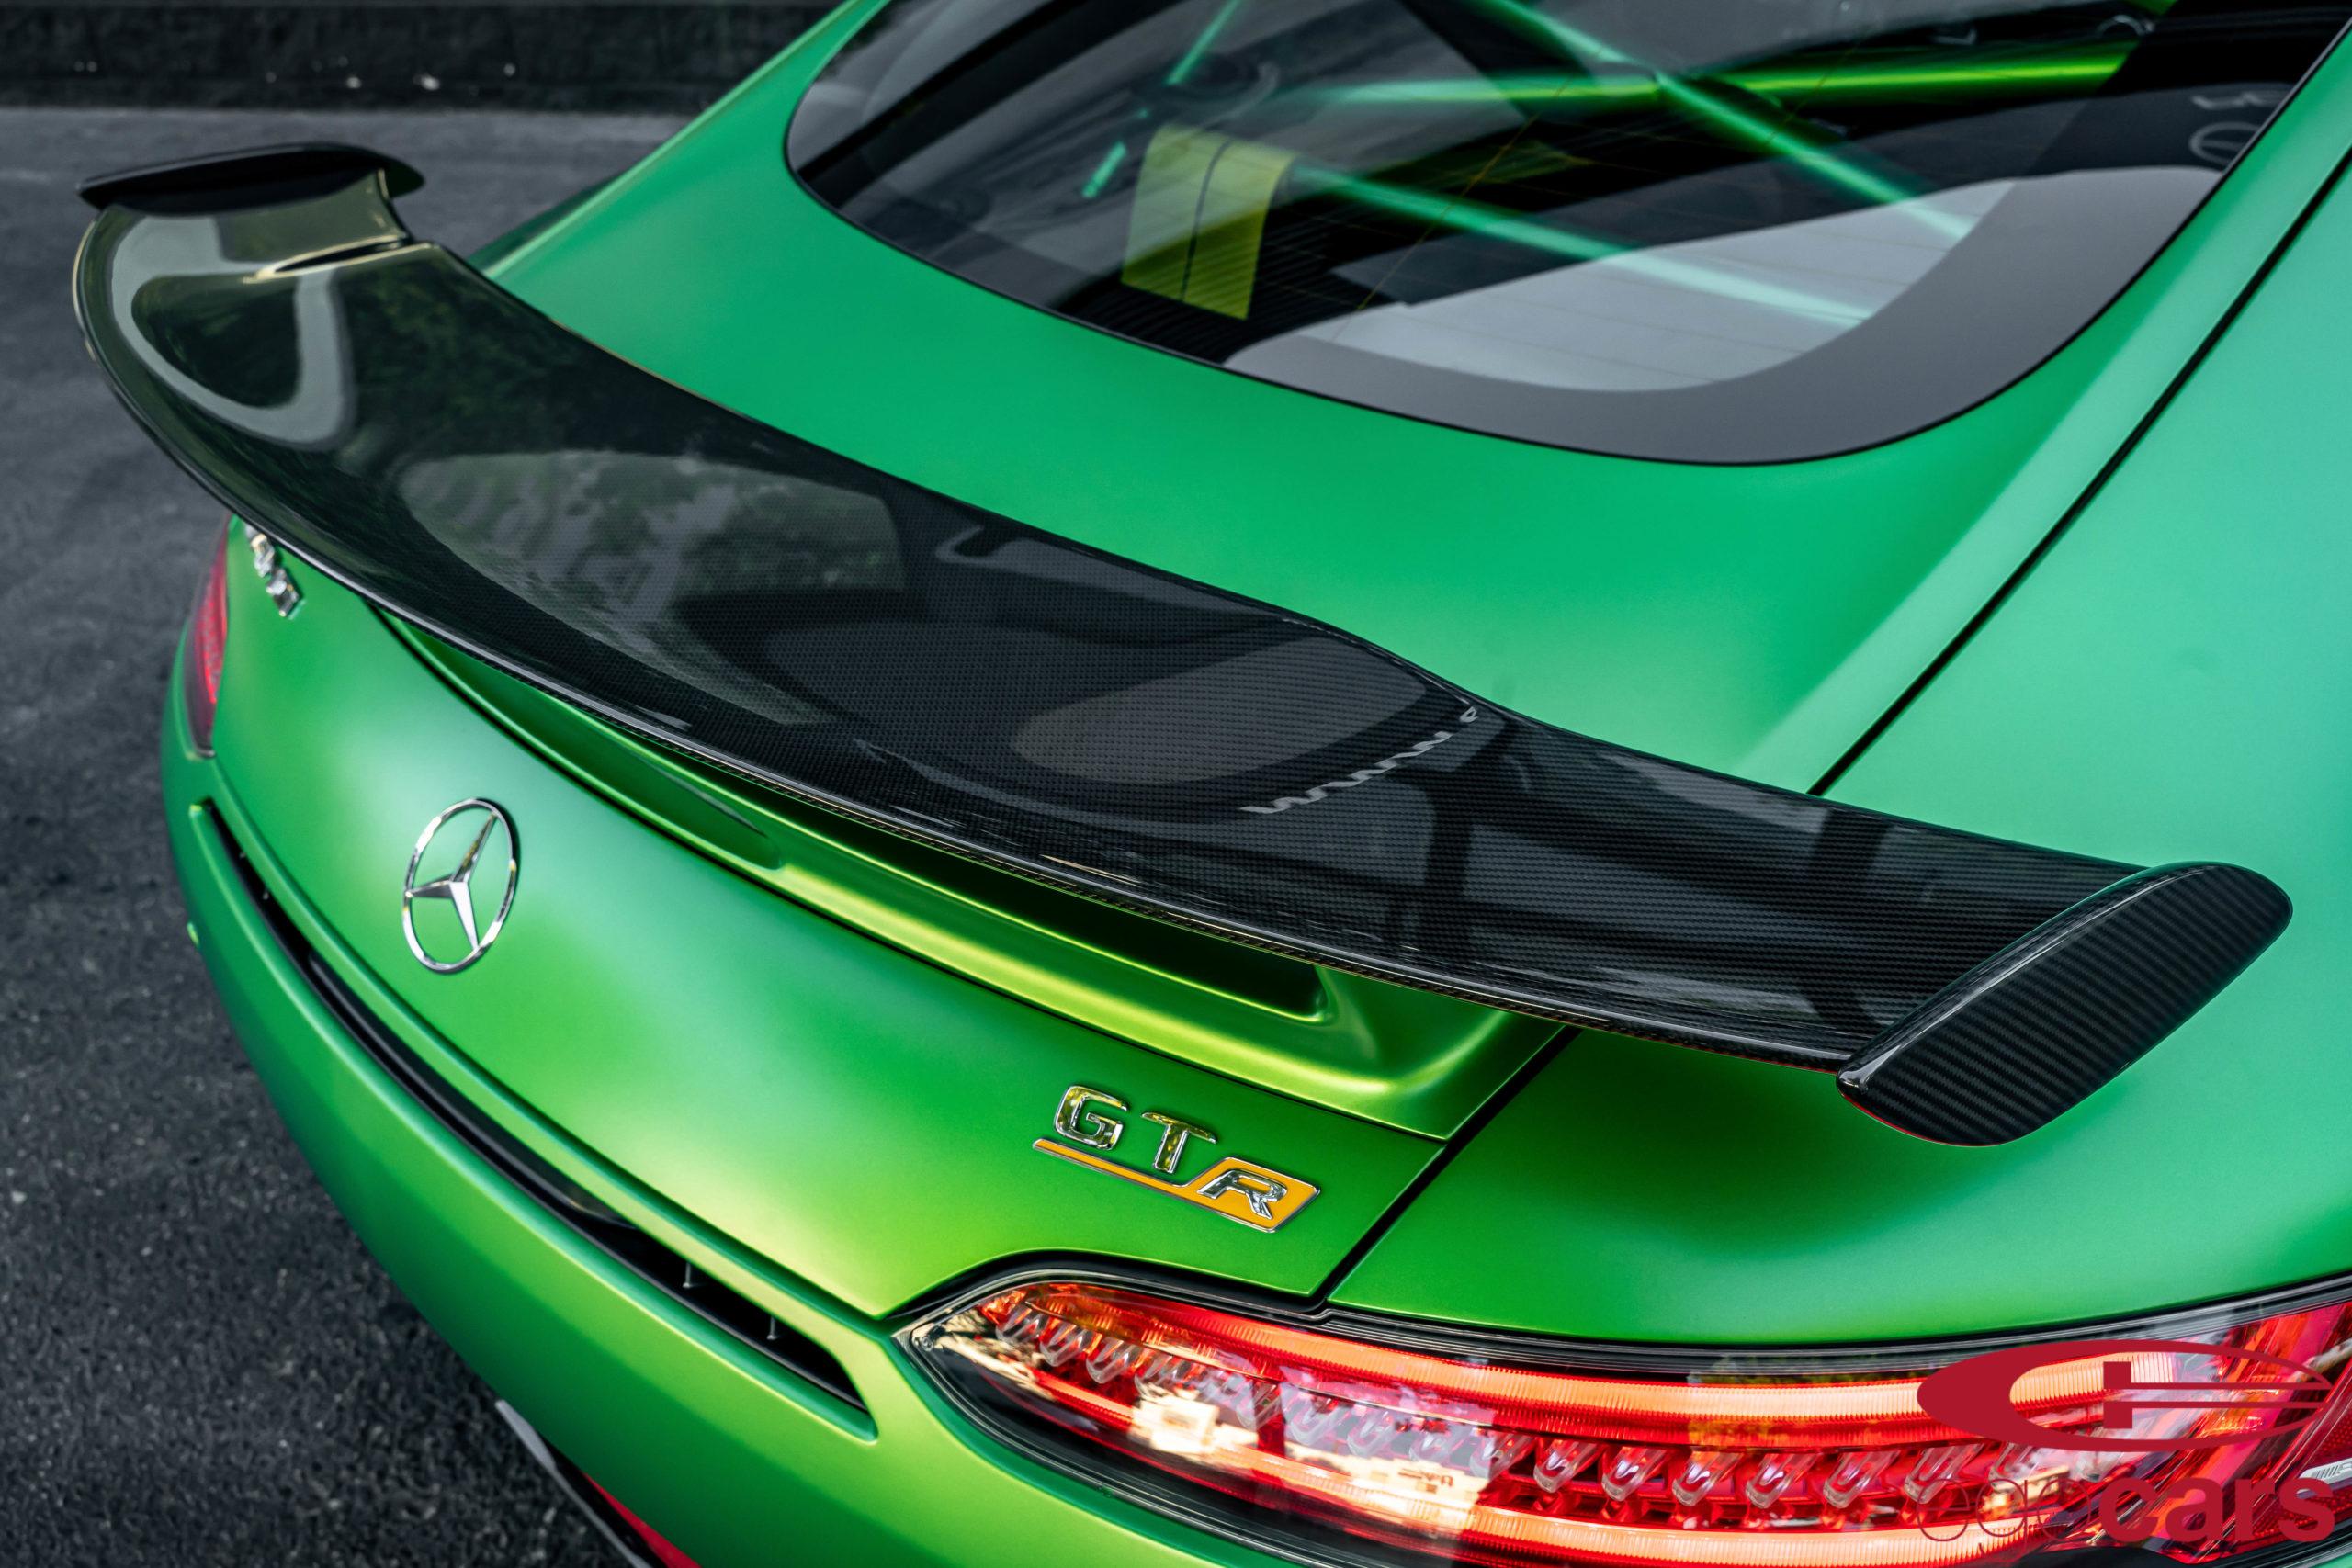 AMG GTR GREEN MAGNO EGOCARS_58